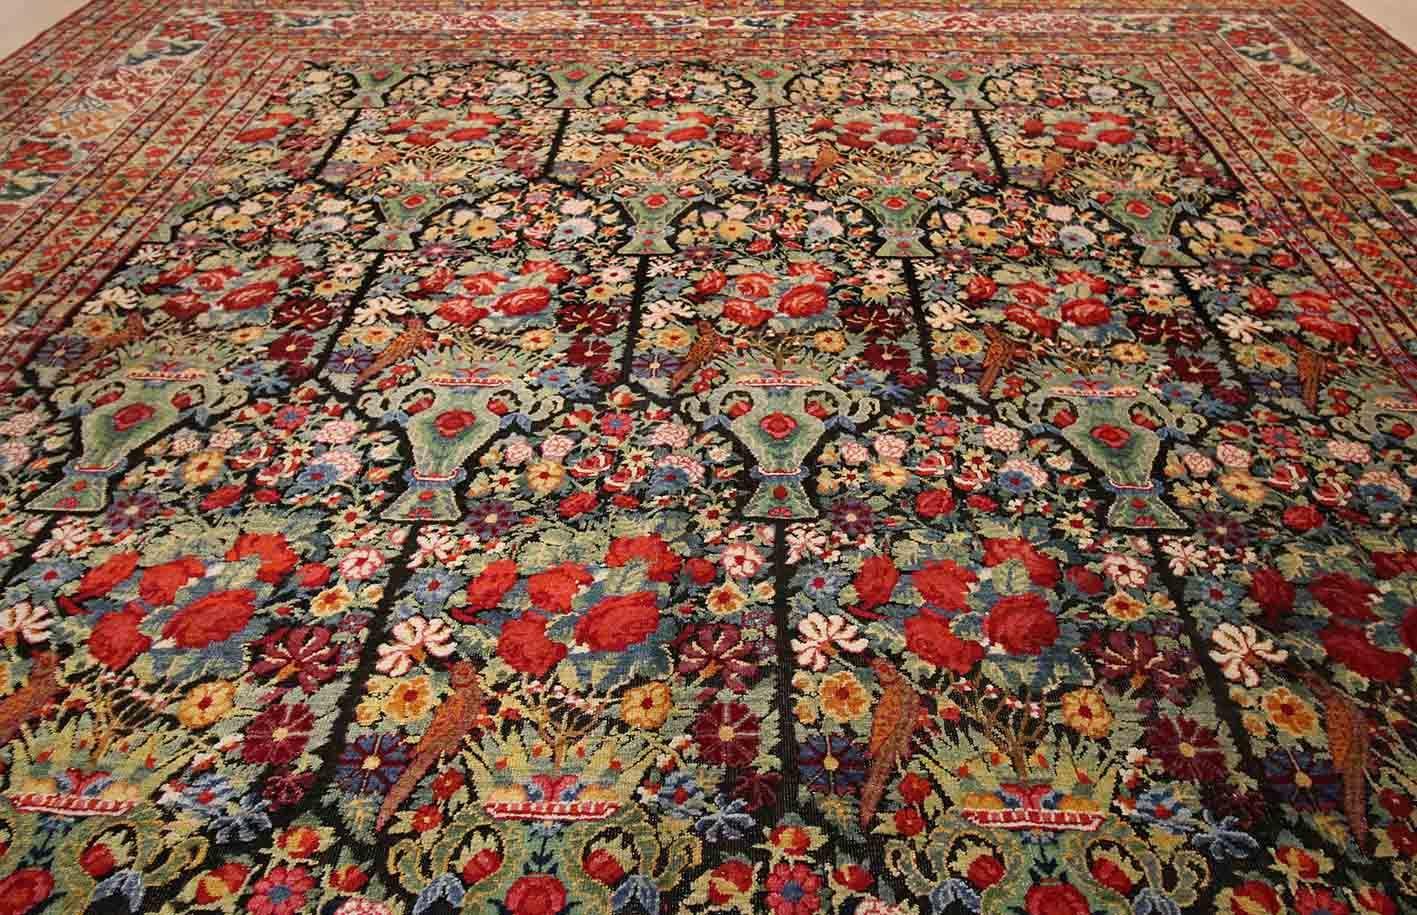 One Of The Most Beautiful Rug Of Kerman 1876 Hossein Kermani Www Malool Com Antique Carpets Beautiful Rug Antiques